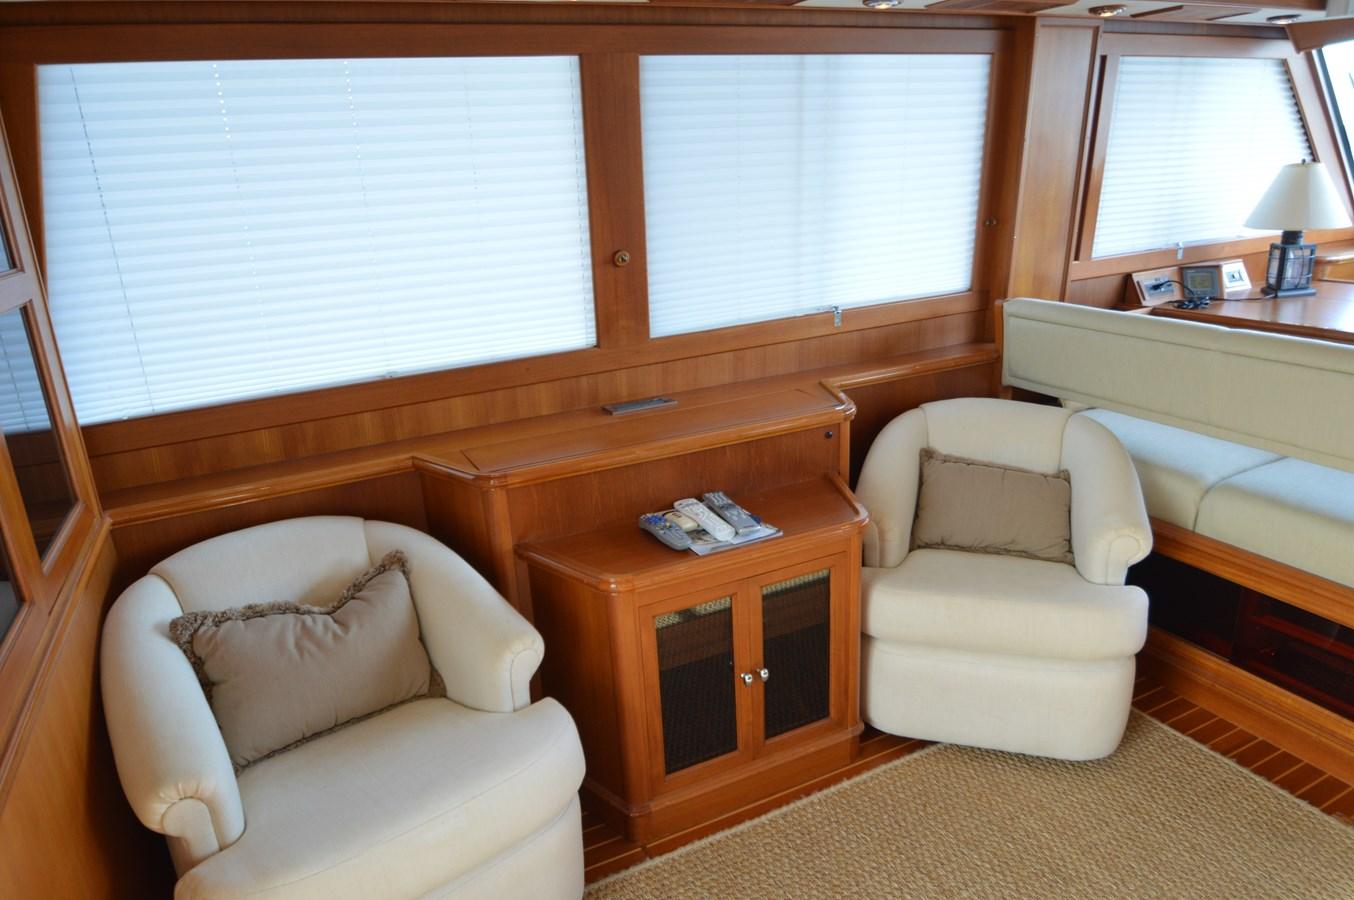 52 2004 GRAND BANKS 58 Eastbay Motor Yacht 2714777